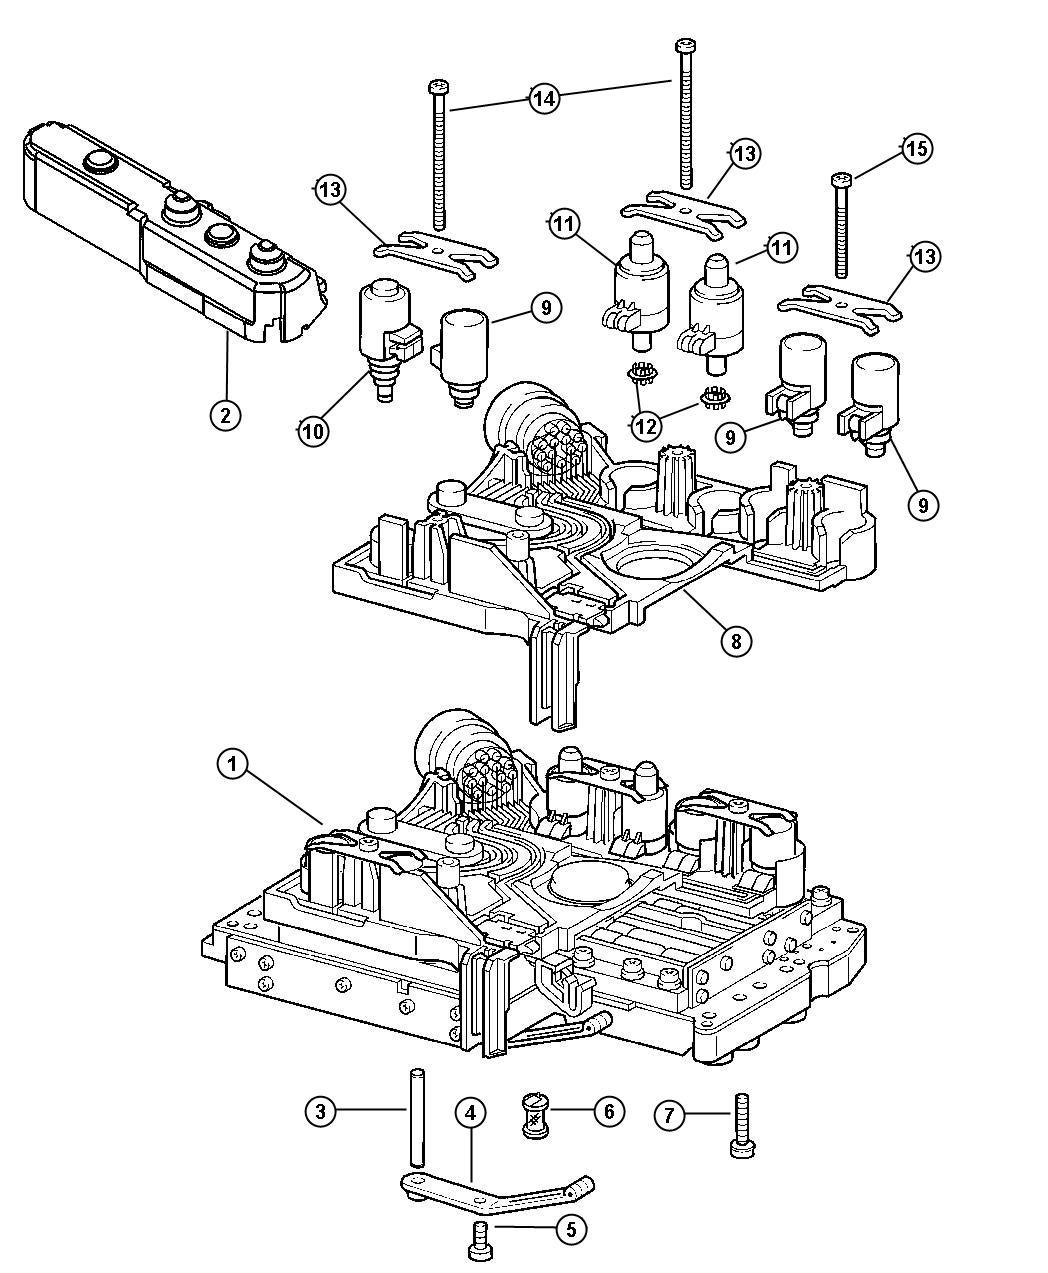 Dodge Caliber Shield. Transmission solenoid. Hydraulic